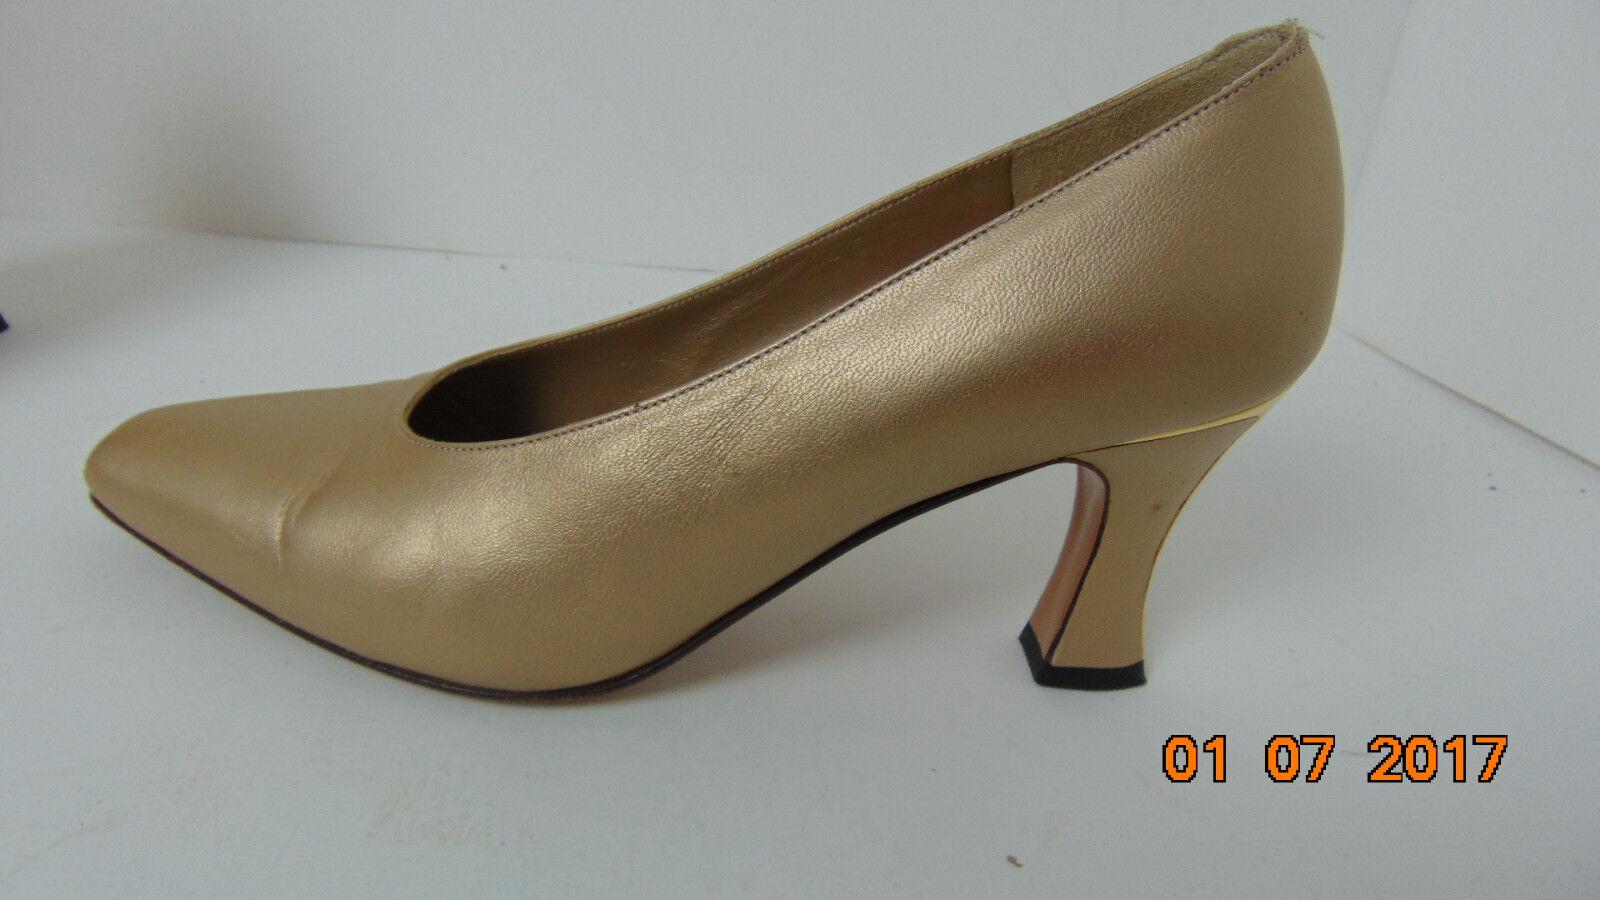 St. John Wheat Beige Metallic Leather Pumps SZ 6.5 B  shoes Made in